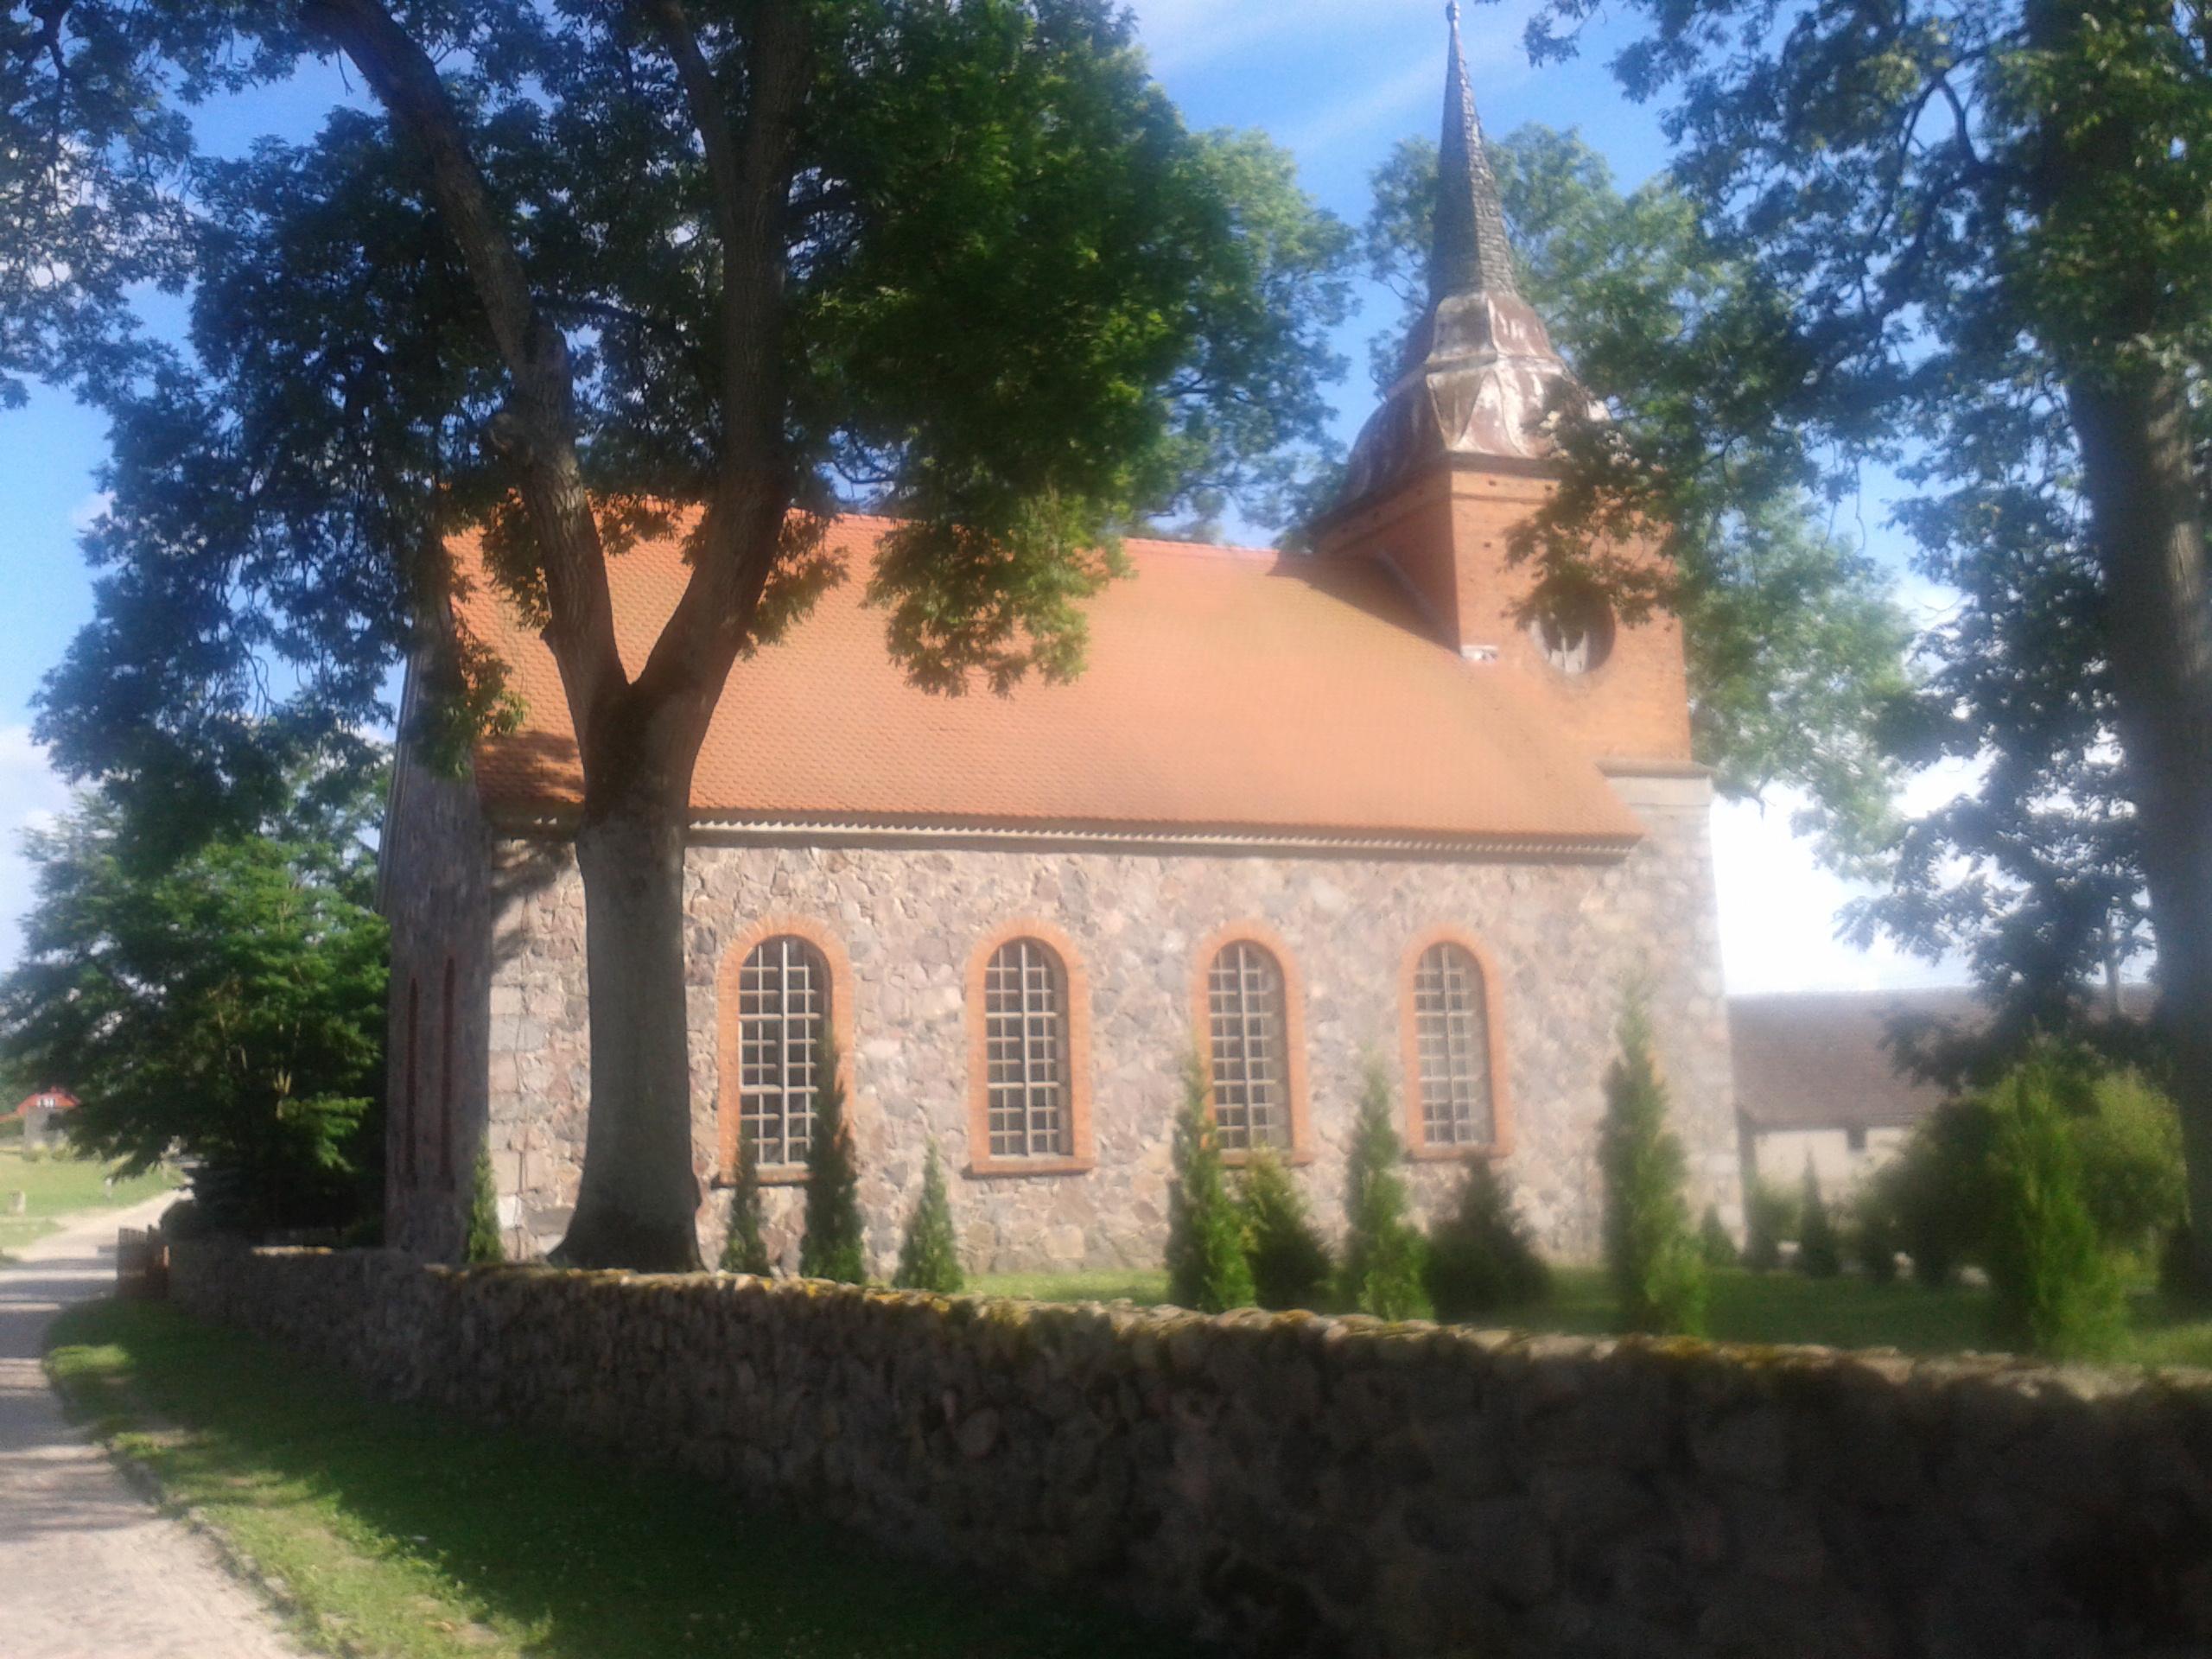 Bonin, Łobez County Quiz